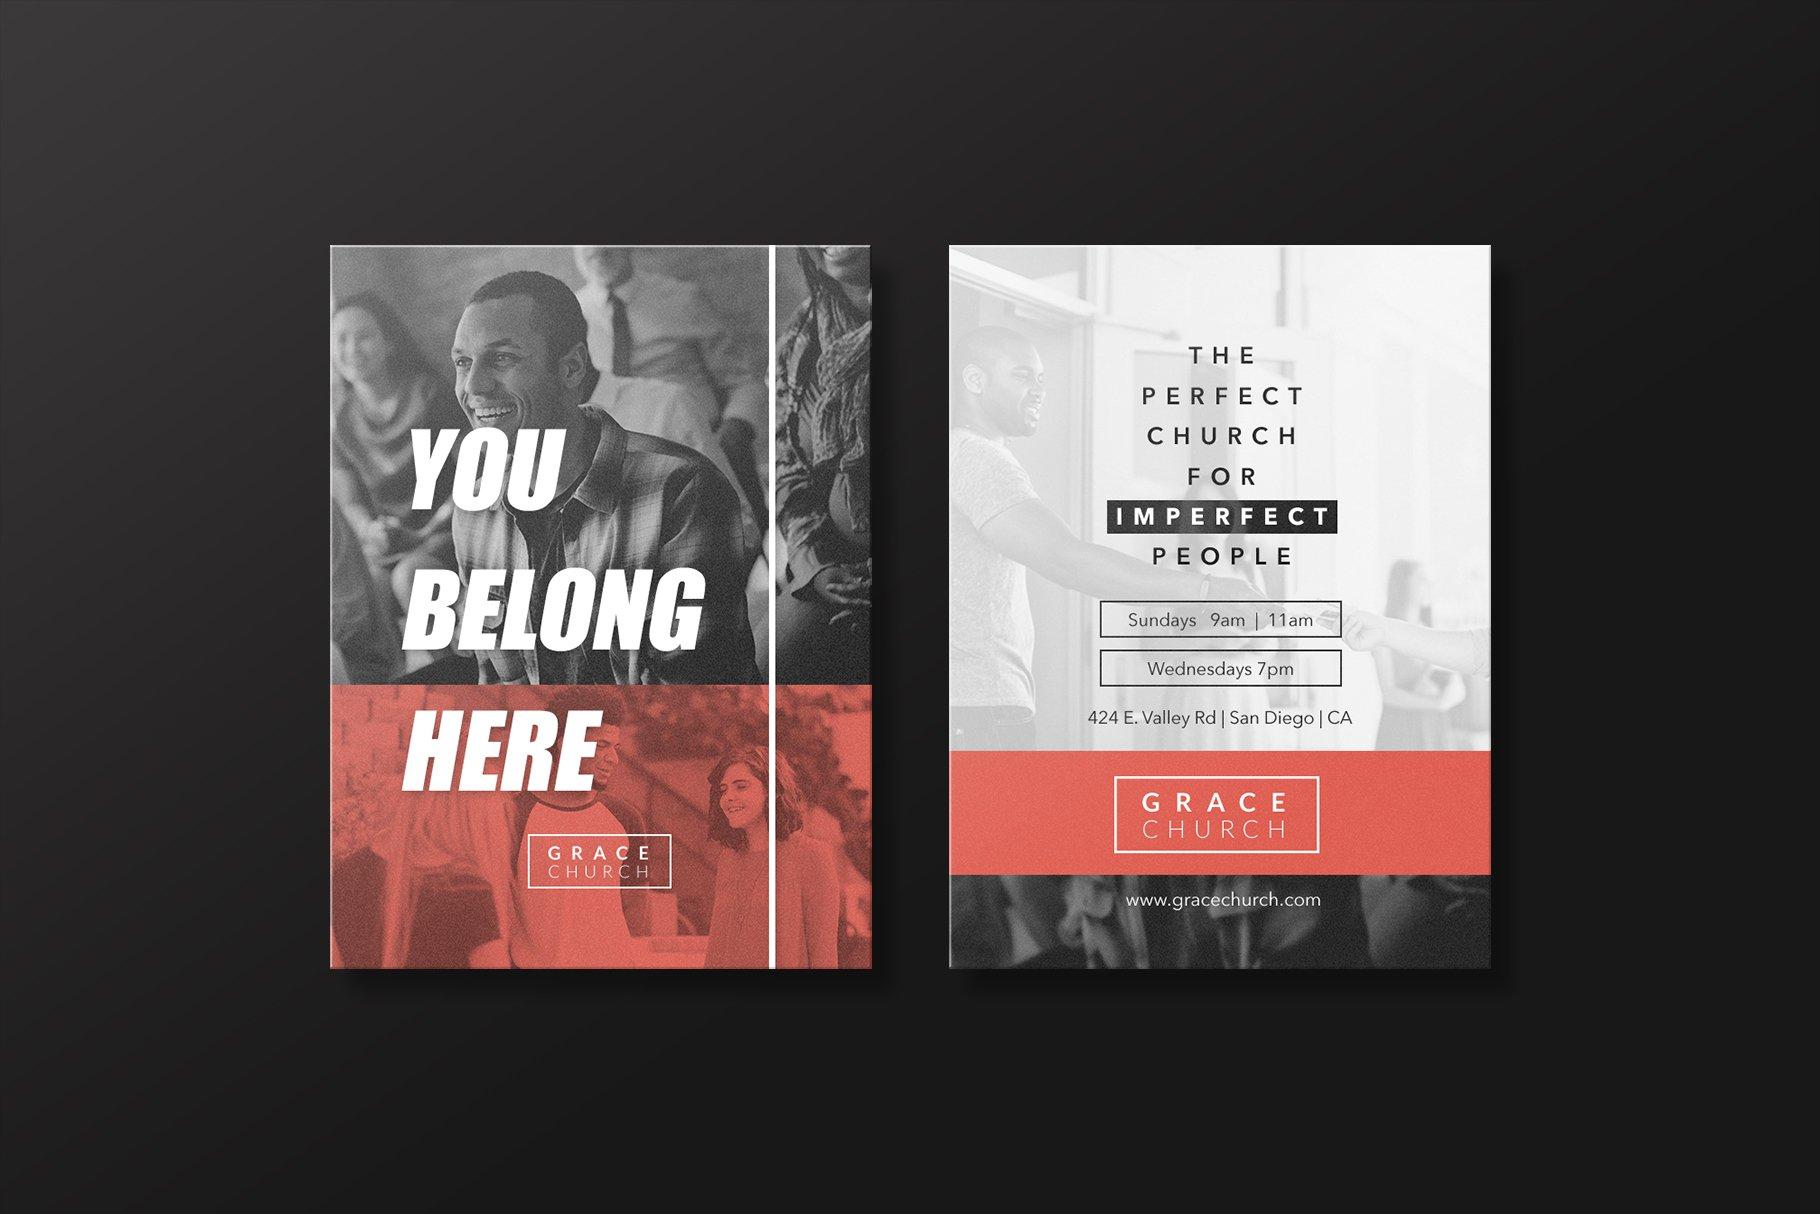 Church Essentials - Invite Card For Church Invite Cards Template